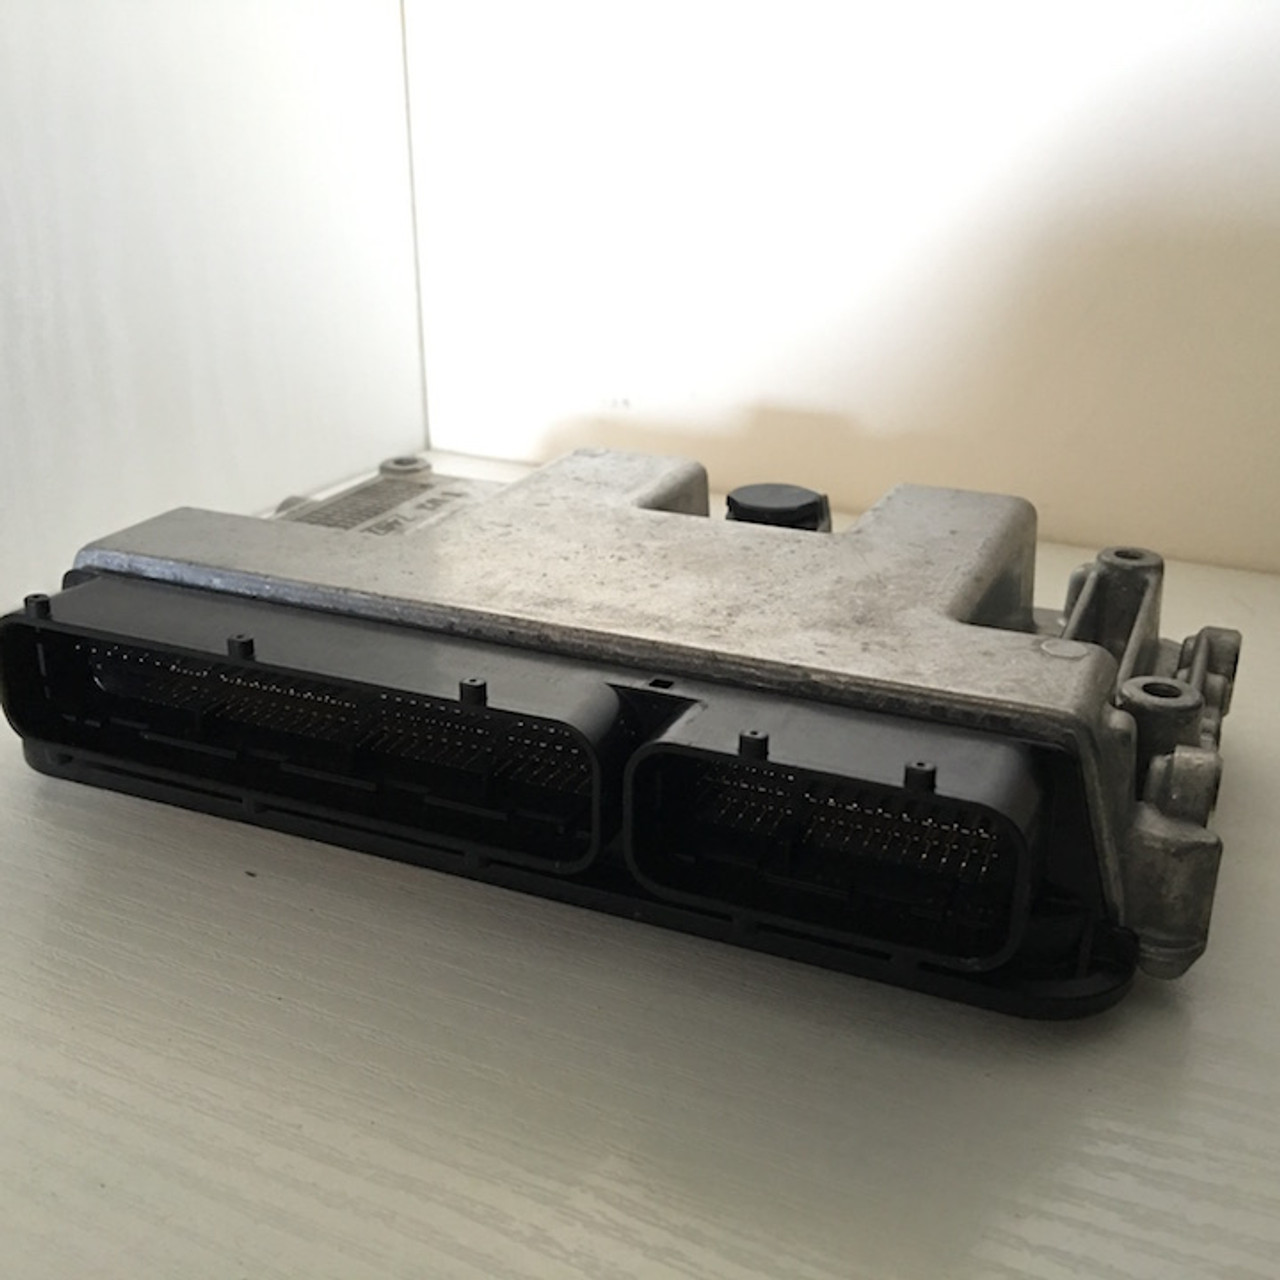 Toyota Avensis 2.0 D-4D, 0281033213, 0 281 033 213, 89661-05P60